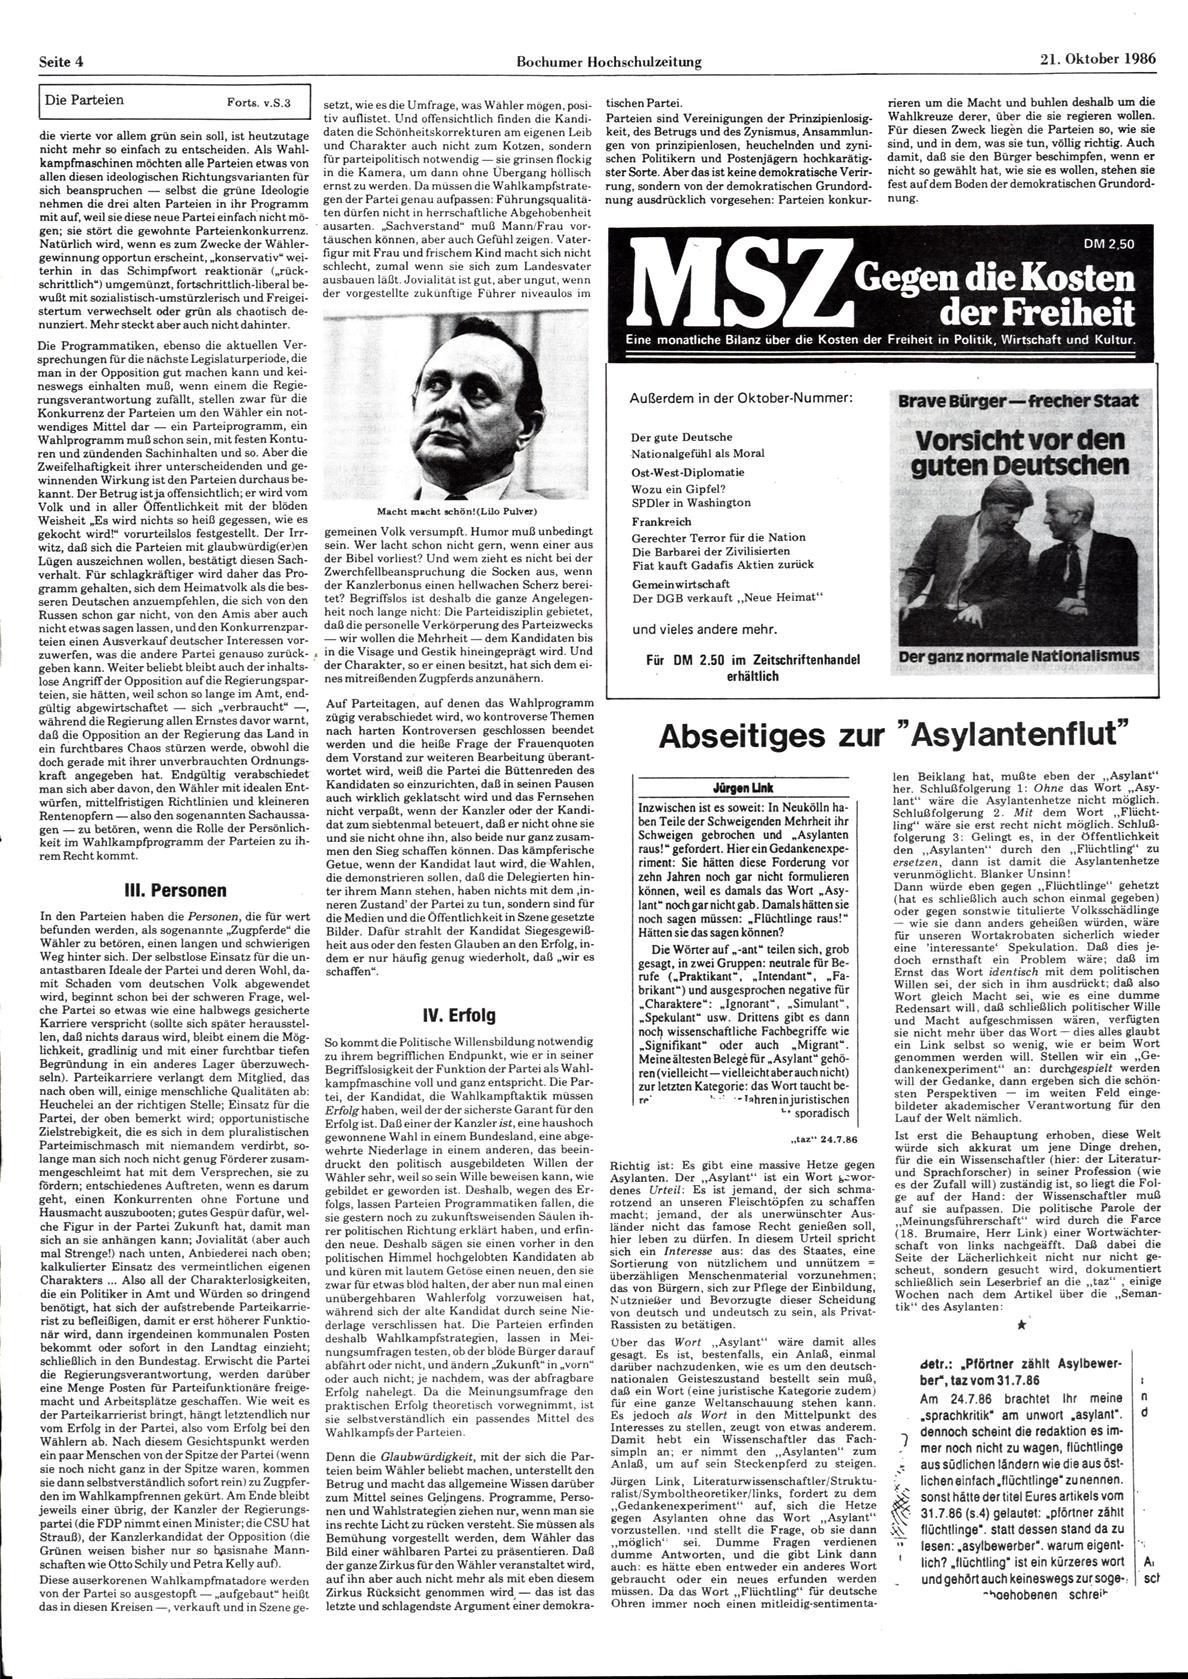 Bochum_BHZ_19861021_136_004